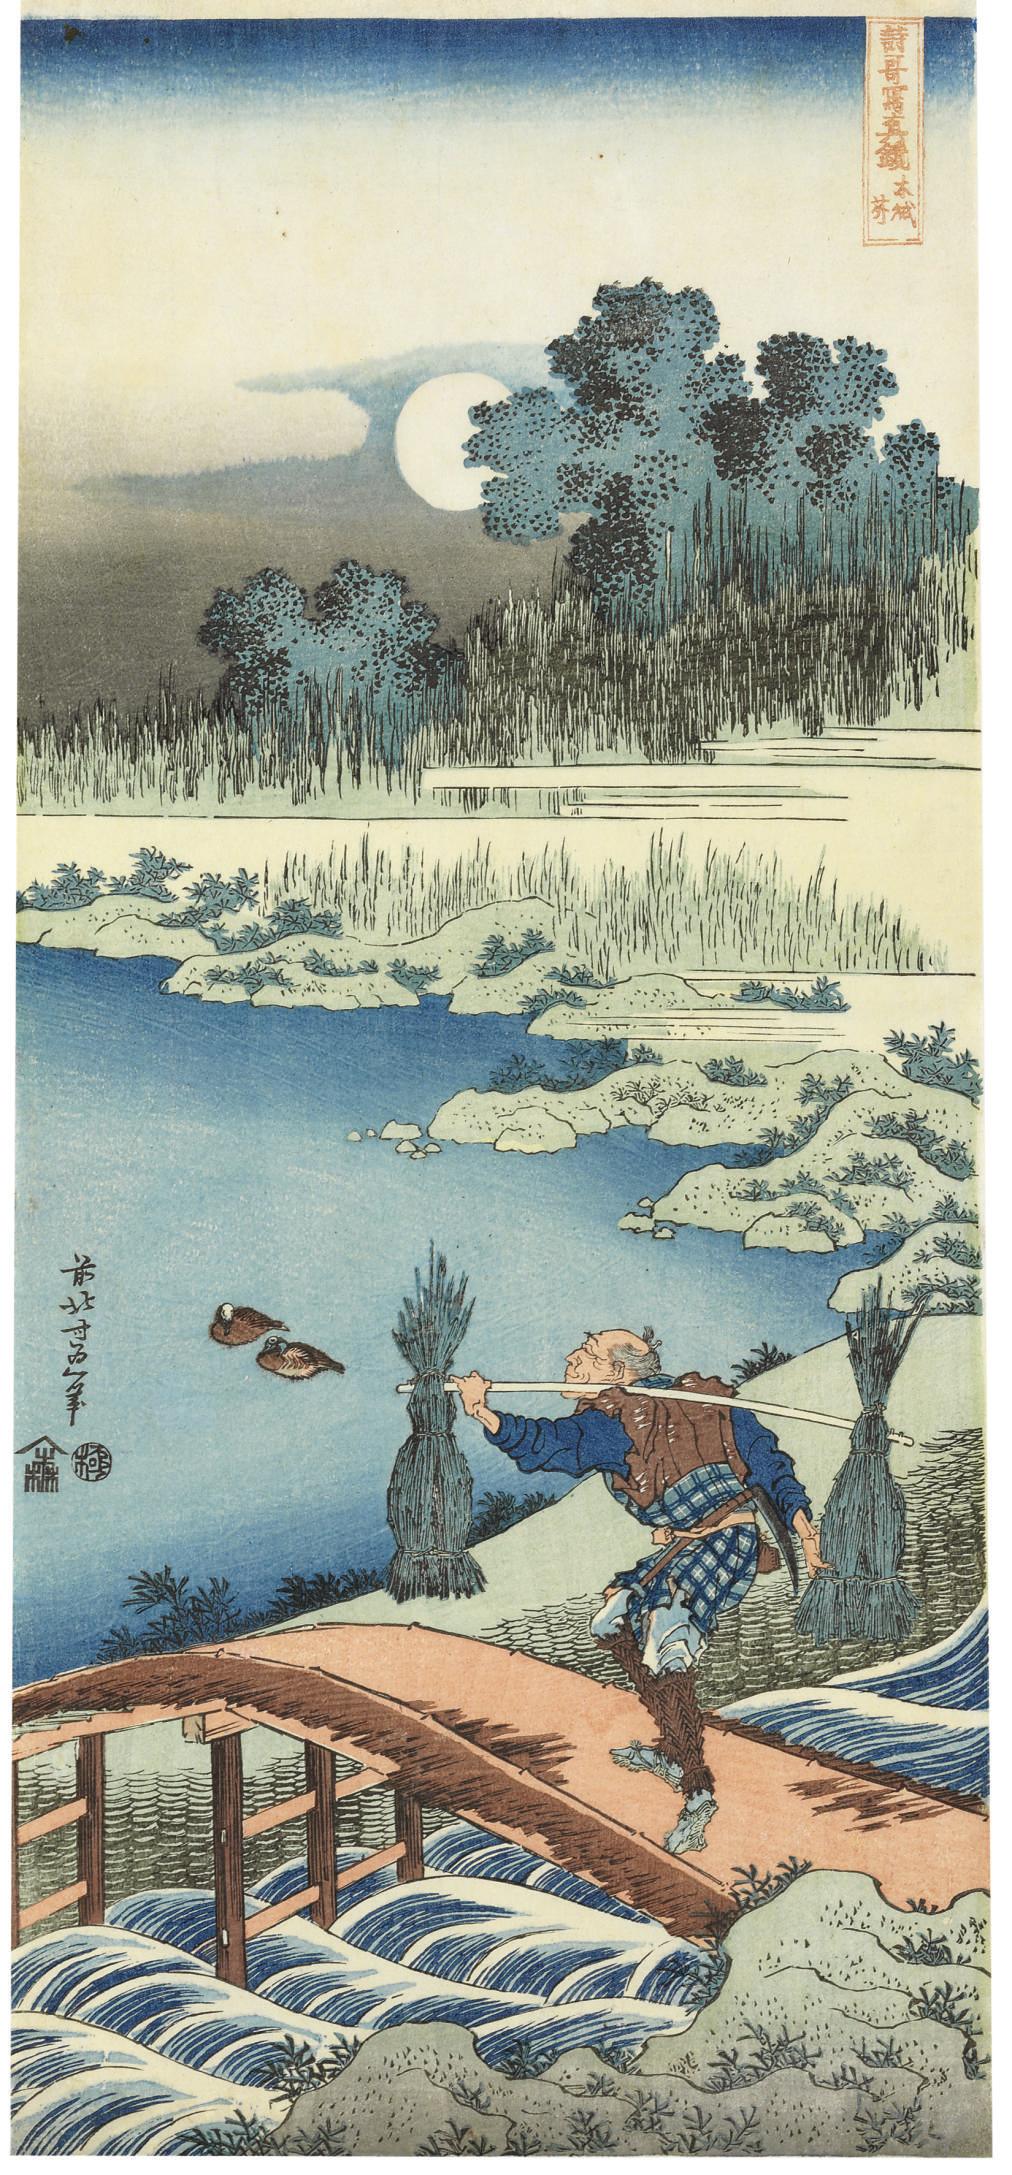 Tokusagari (Carrying rushes), from the series Shika shashinkyo (A true mirror of Chinese and Japanese verse)